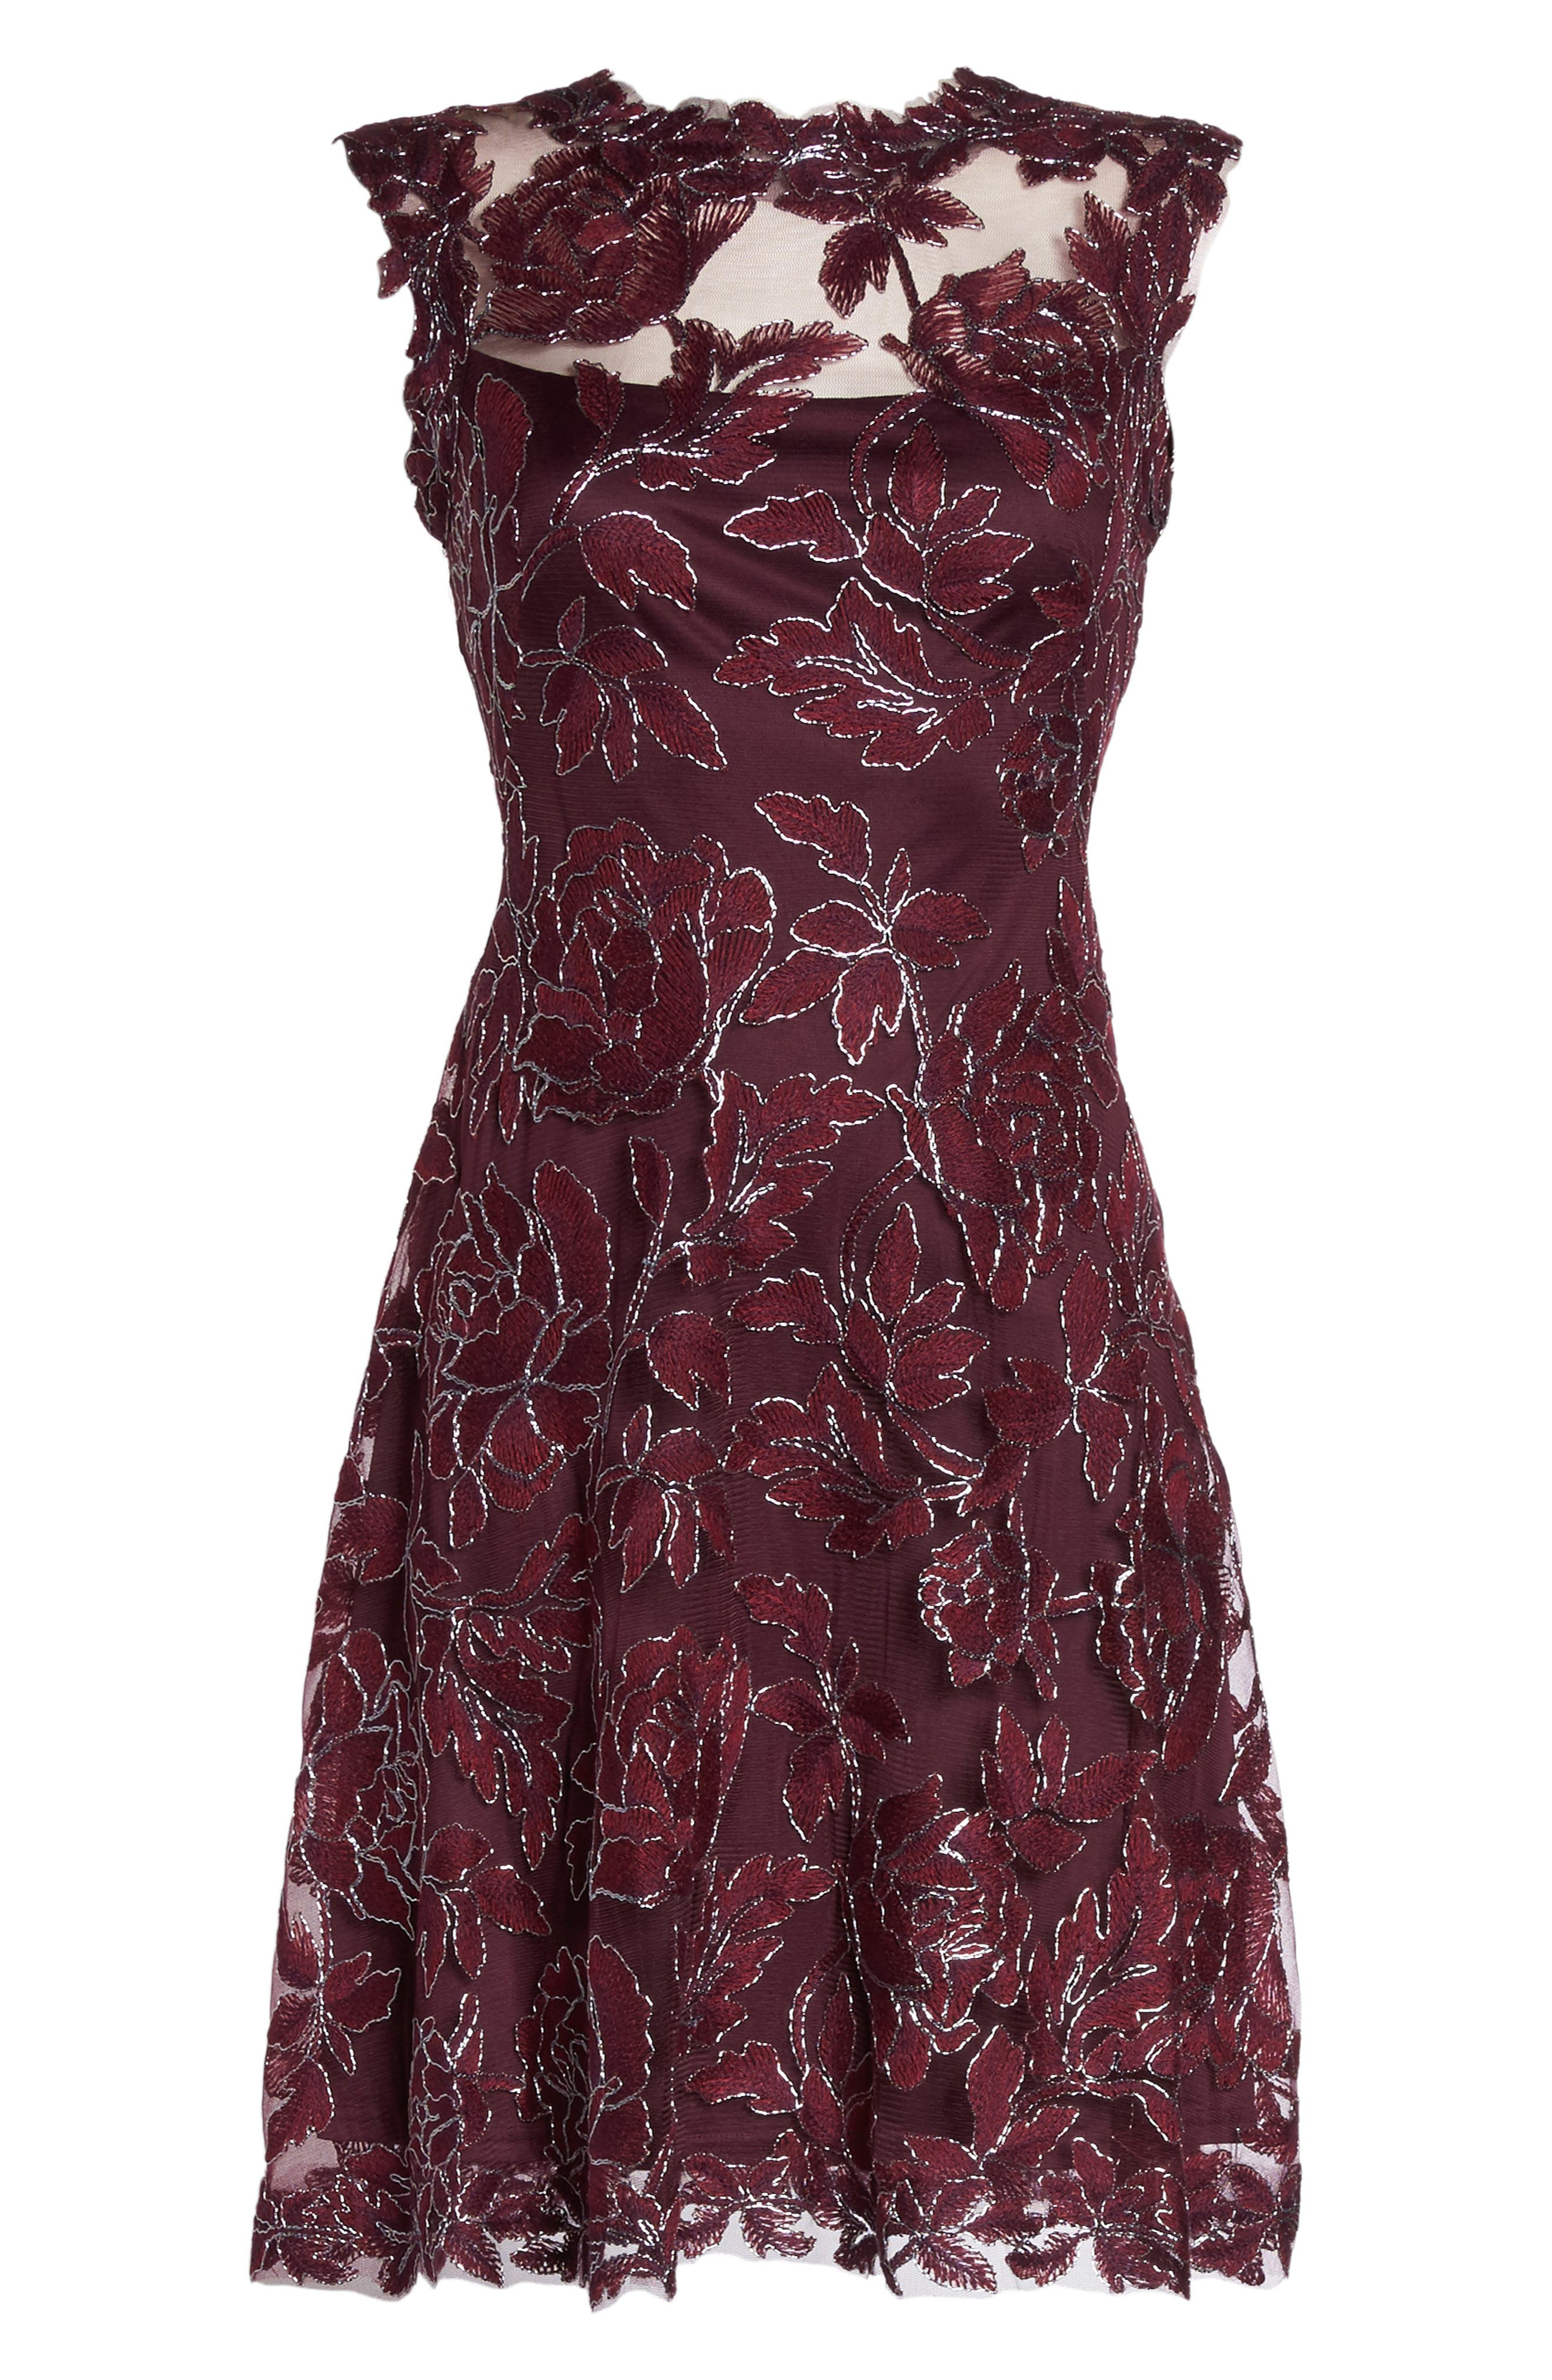 Noelle Floral Fit & Flare Dress,                             Alternate thumbnail 6, color,                             572